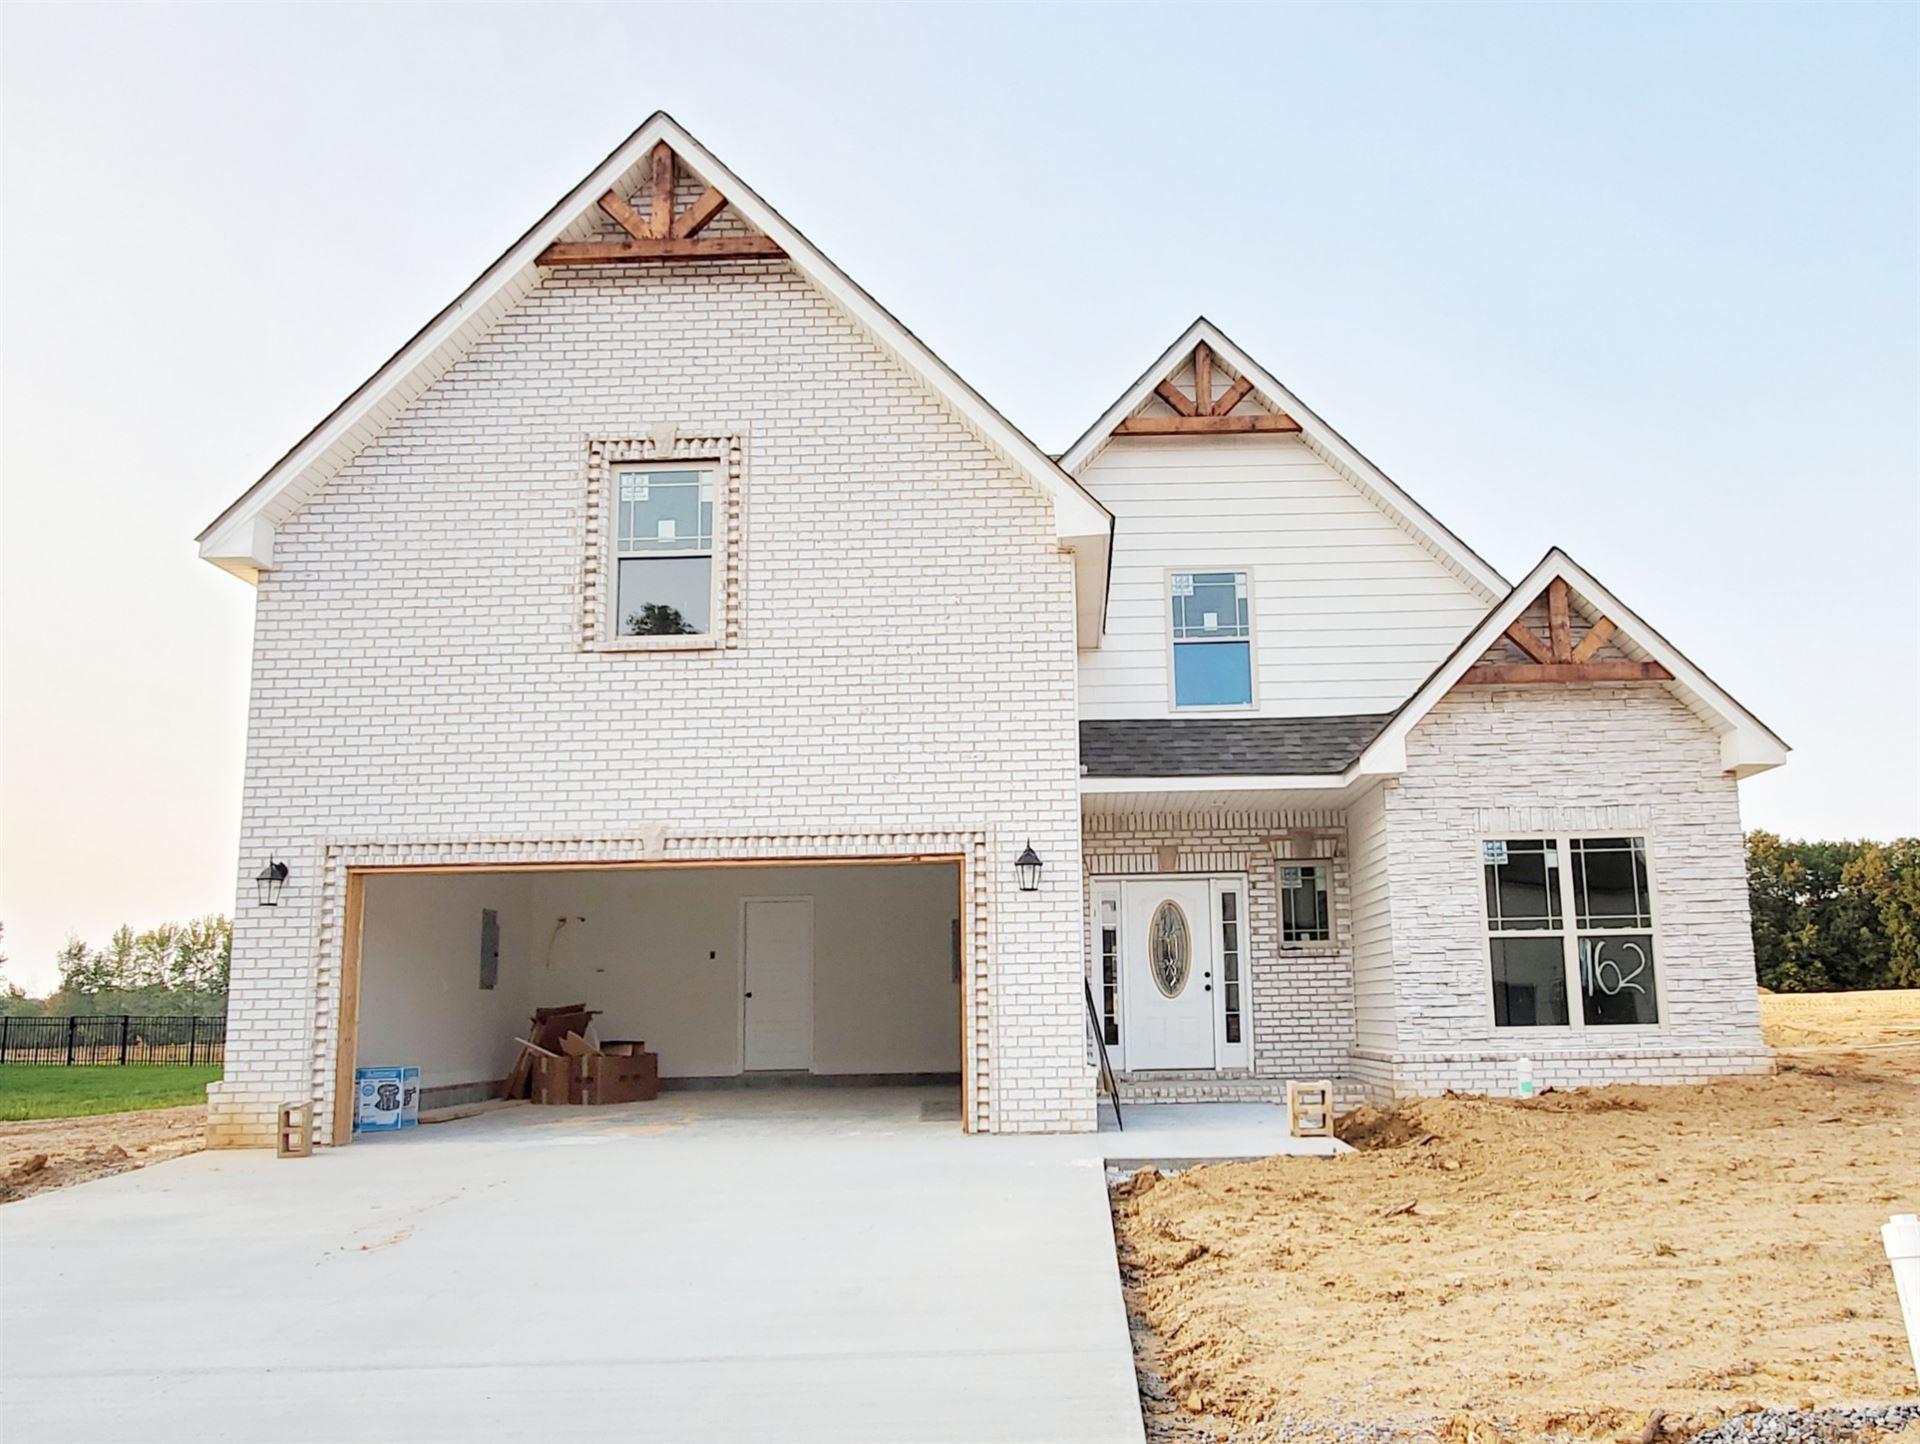 162 Easthaven, Clarksville, TN 37043 - MLS#: 2130007